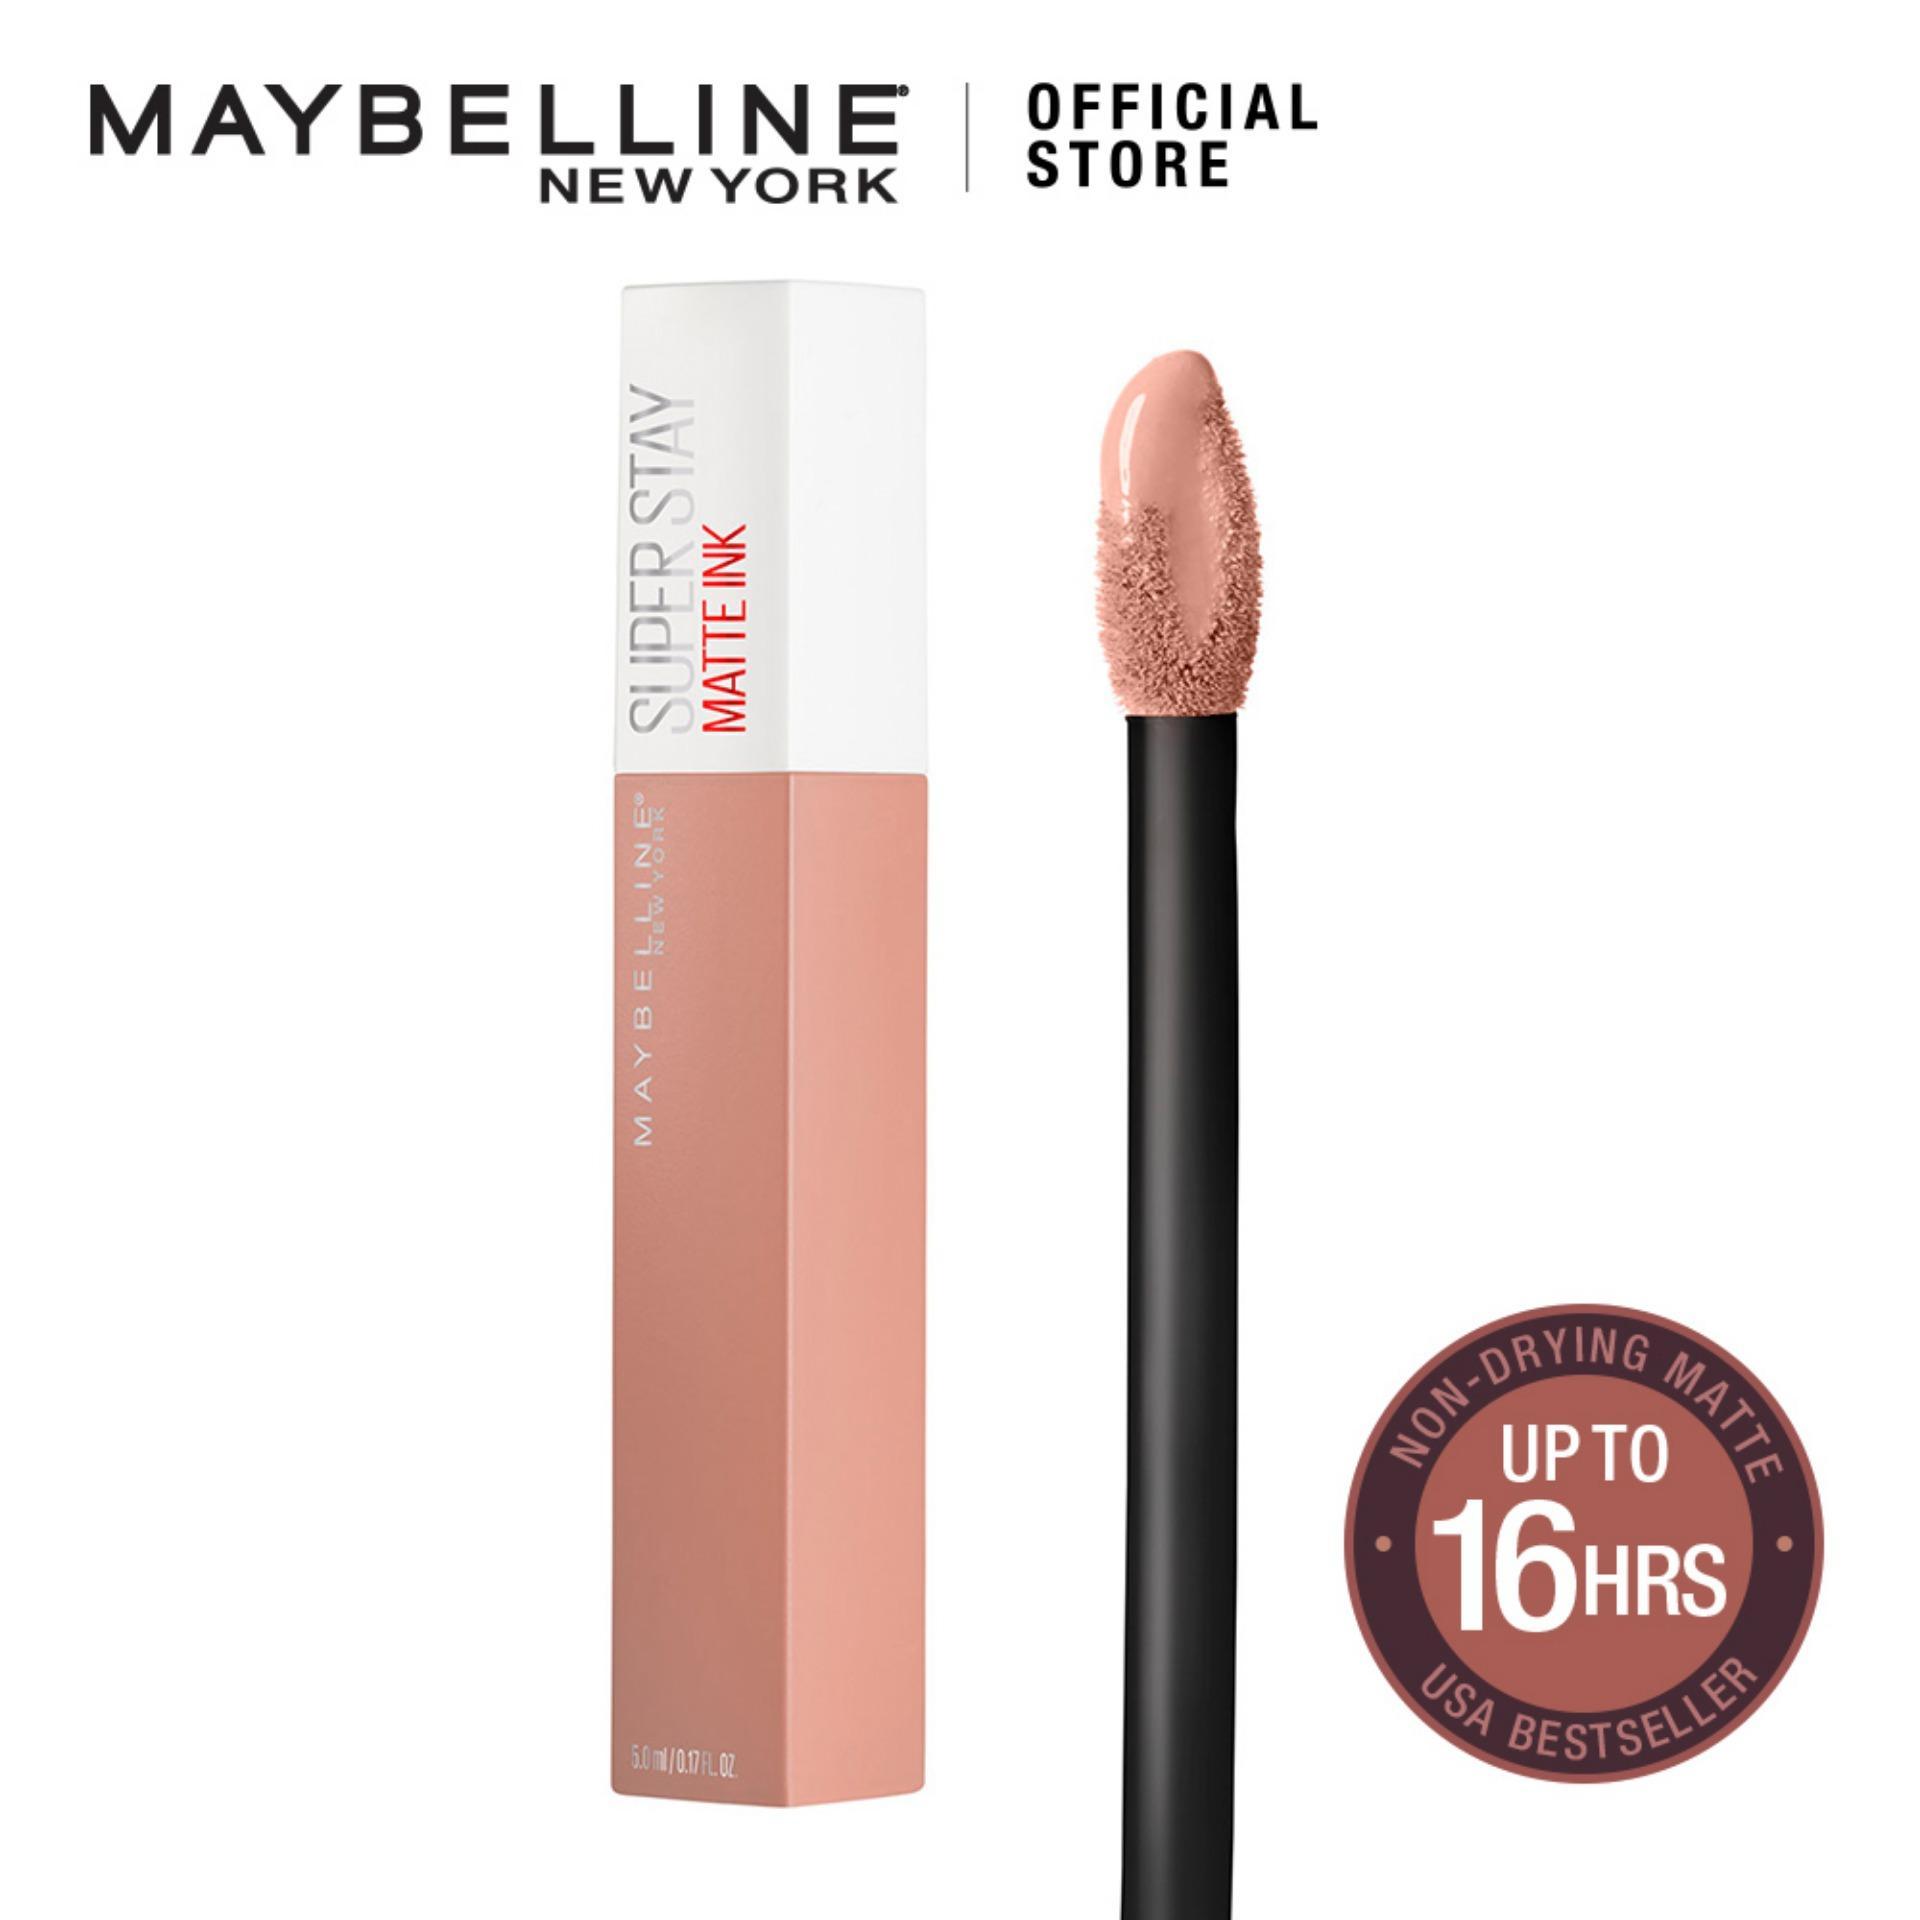 Superstay Matte Ink Un-Nudes Liquid Lipstick - (16h Waterproof) By Maybelline By Maybelline.